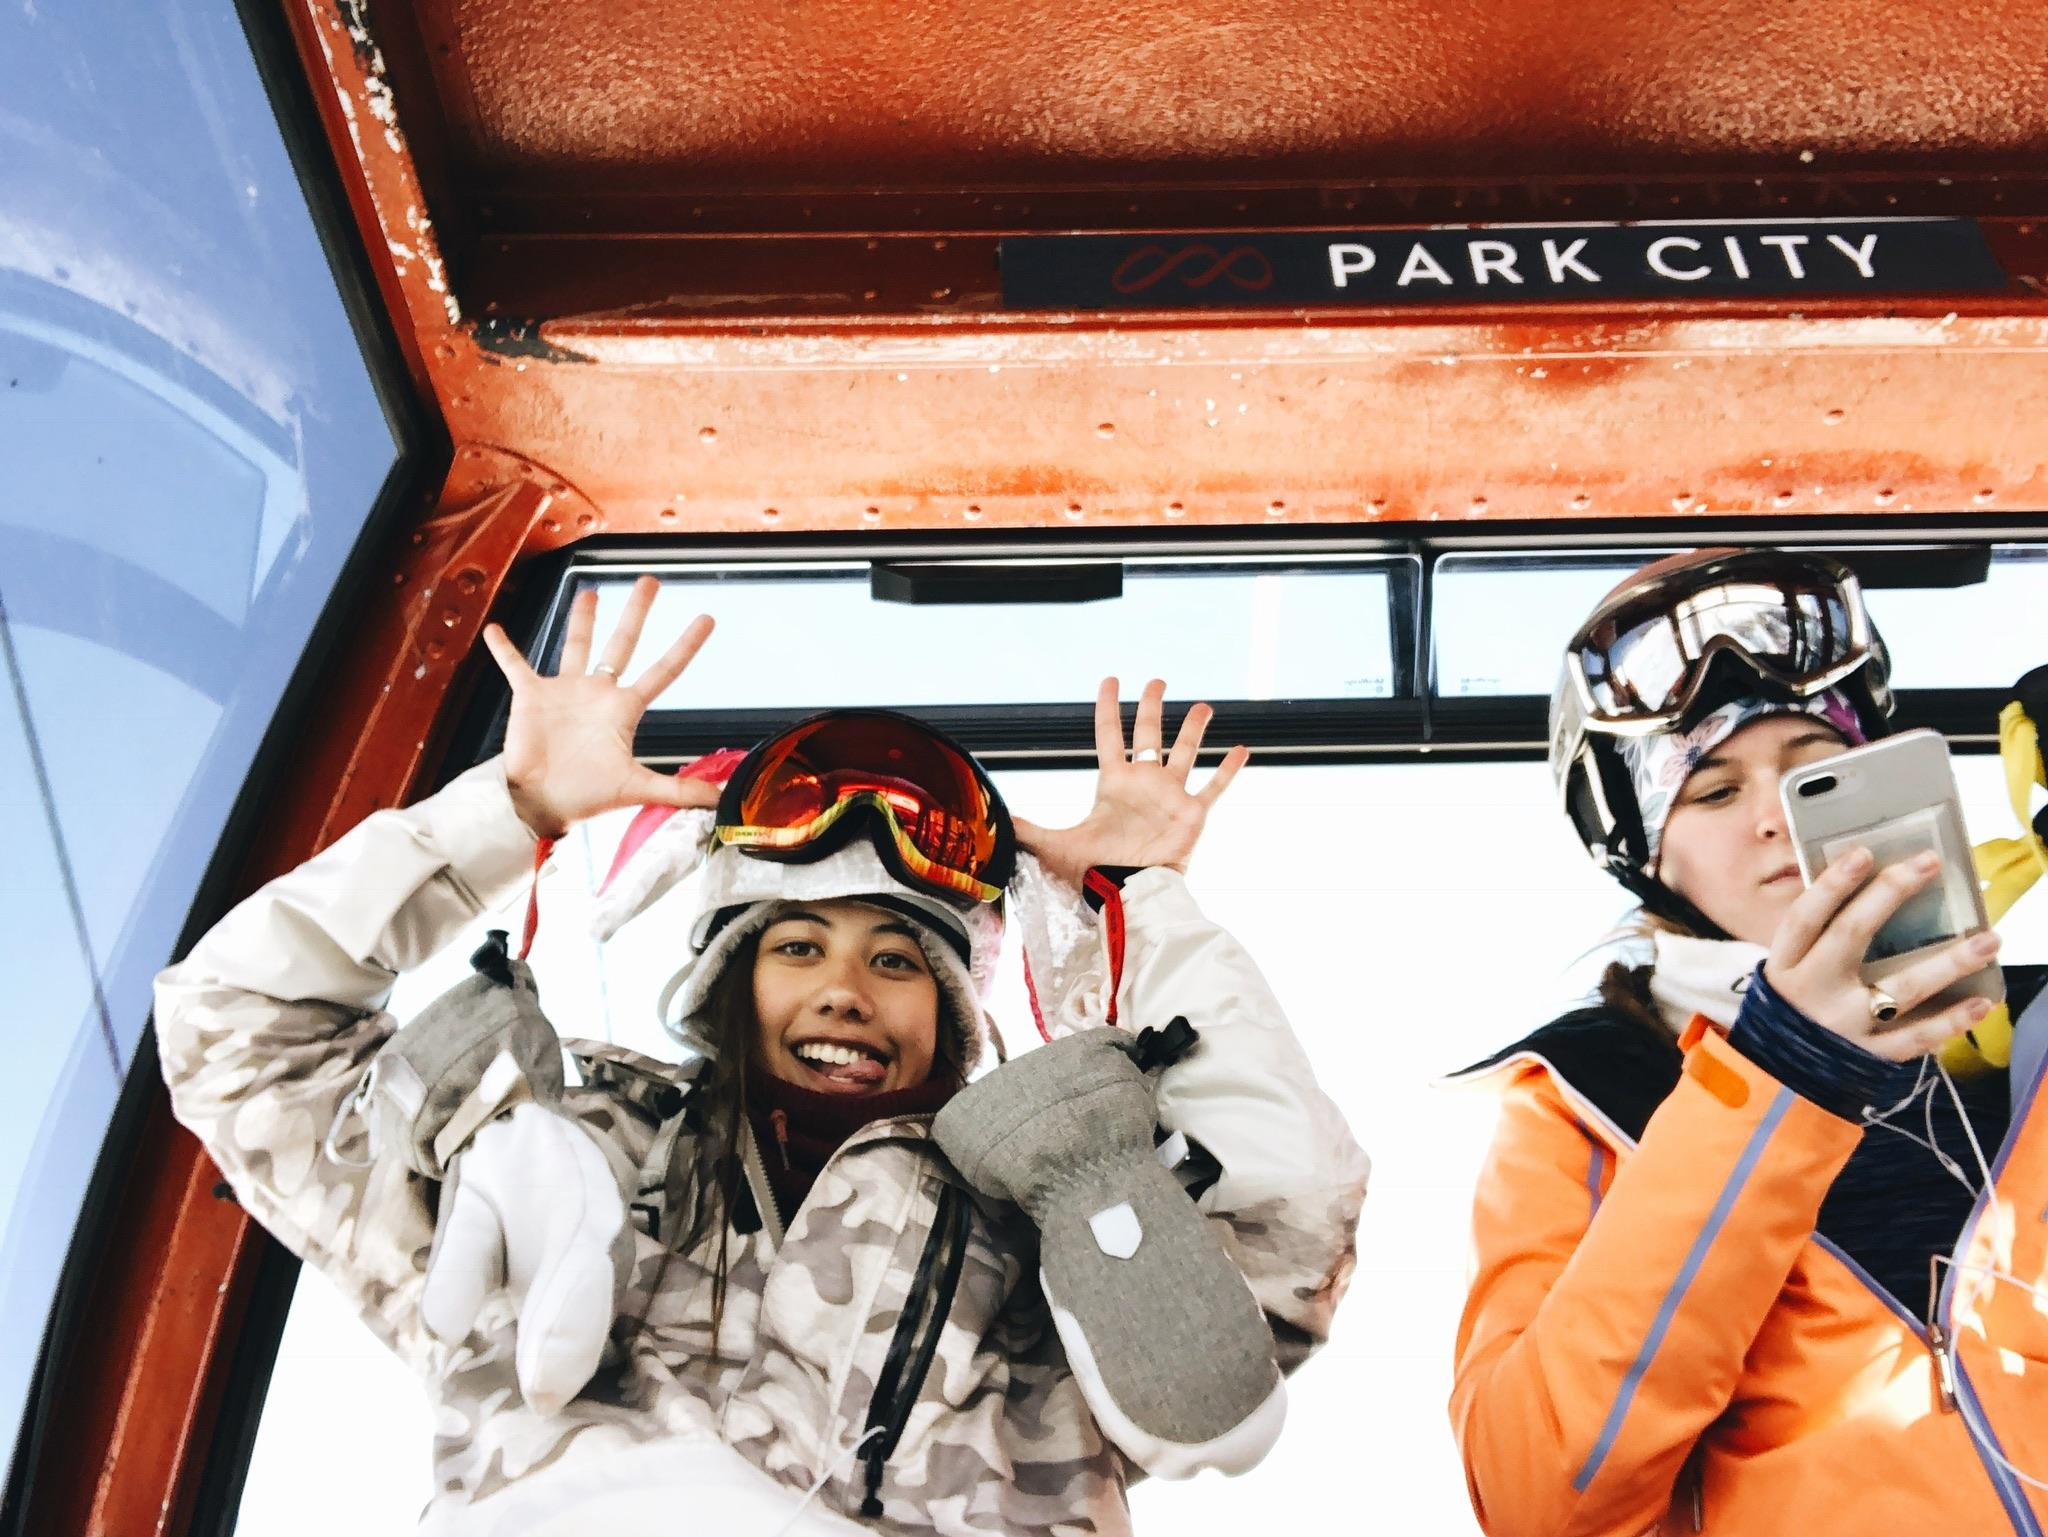 750 Lambo in the Utah snow (skrrt) -